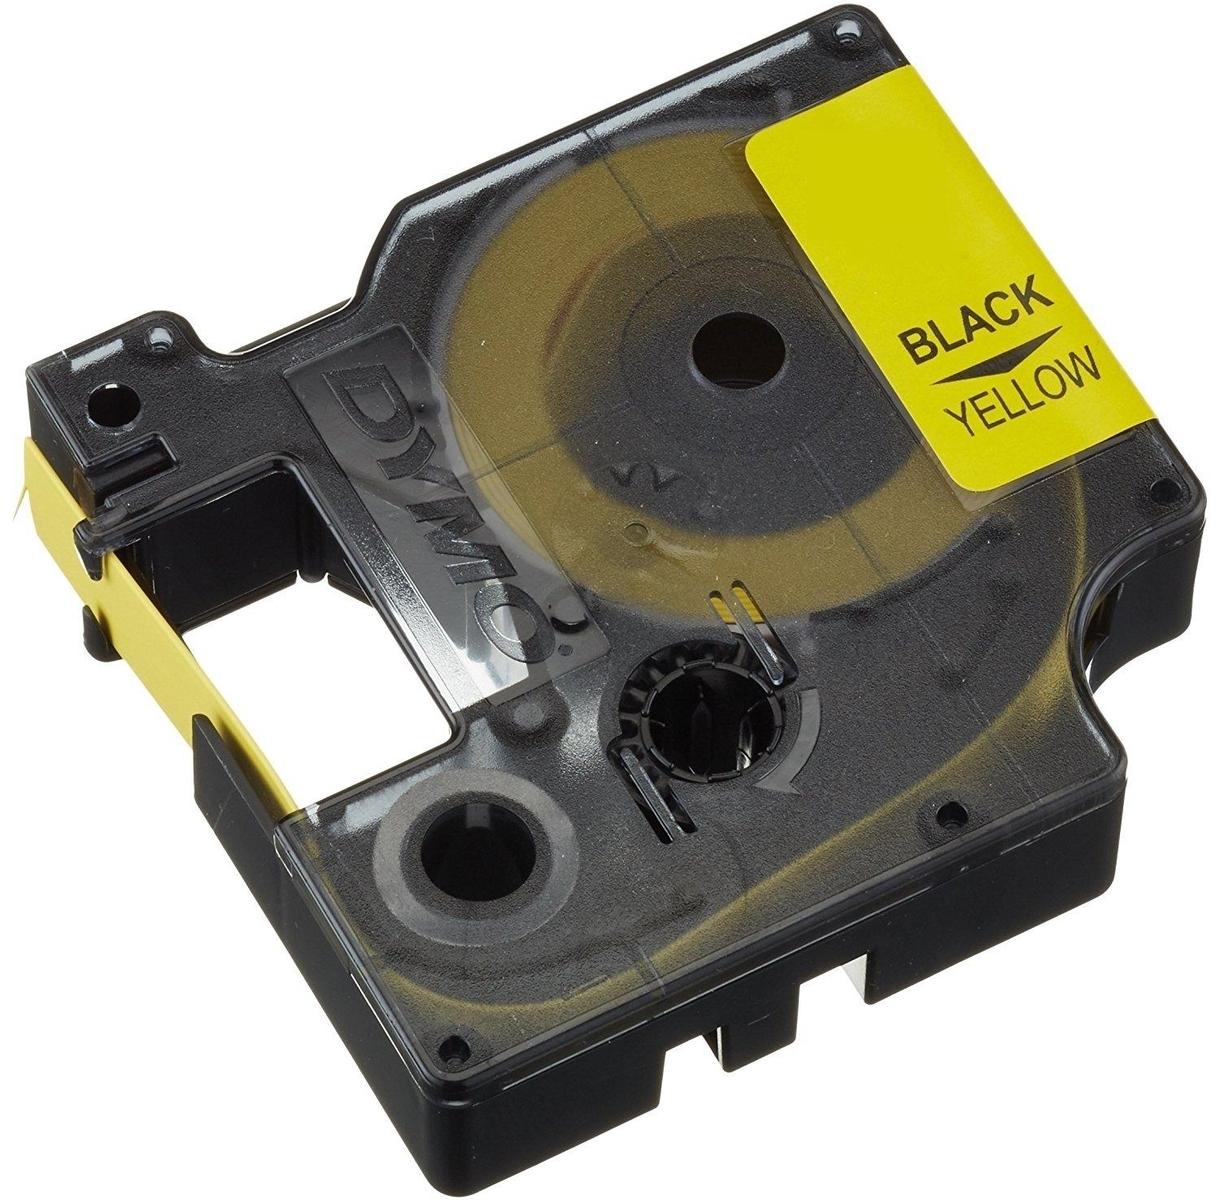 Termokahanev toruprinterile, 19mm x 1,5m, kollane toru/must tekst, Dymo 3M, PLHS-YEL-19